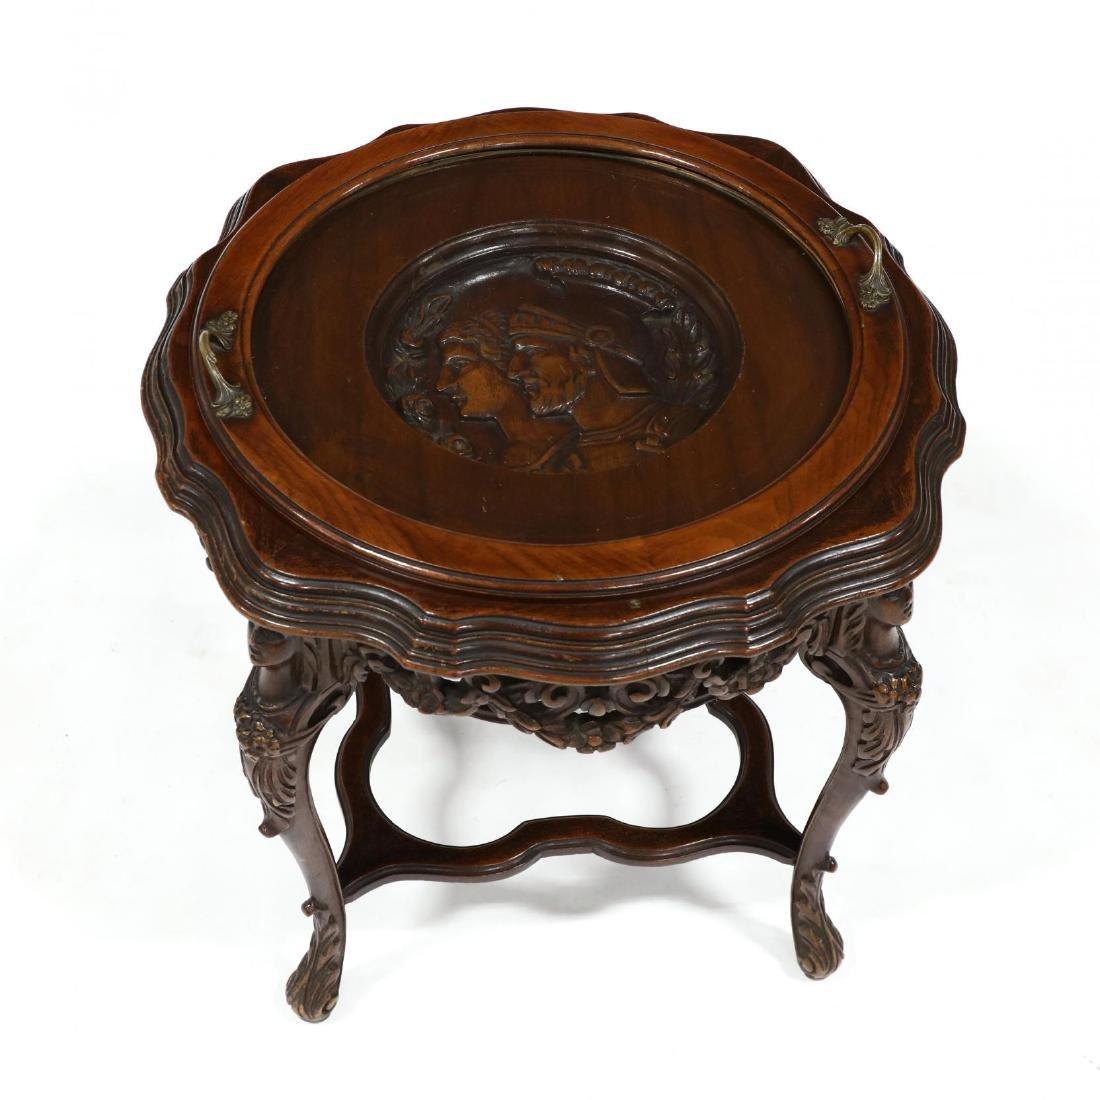 Vintage Italian Carved Walnut Figural Tray Table - 2